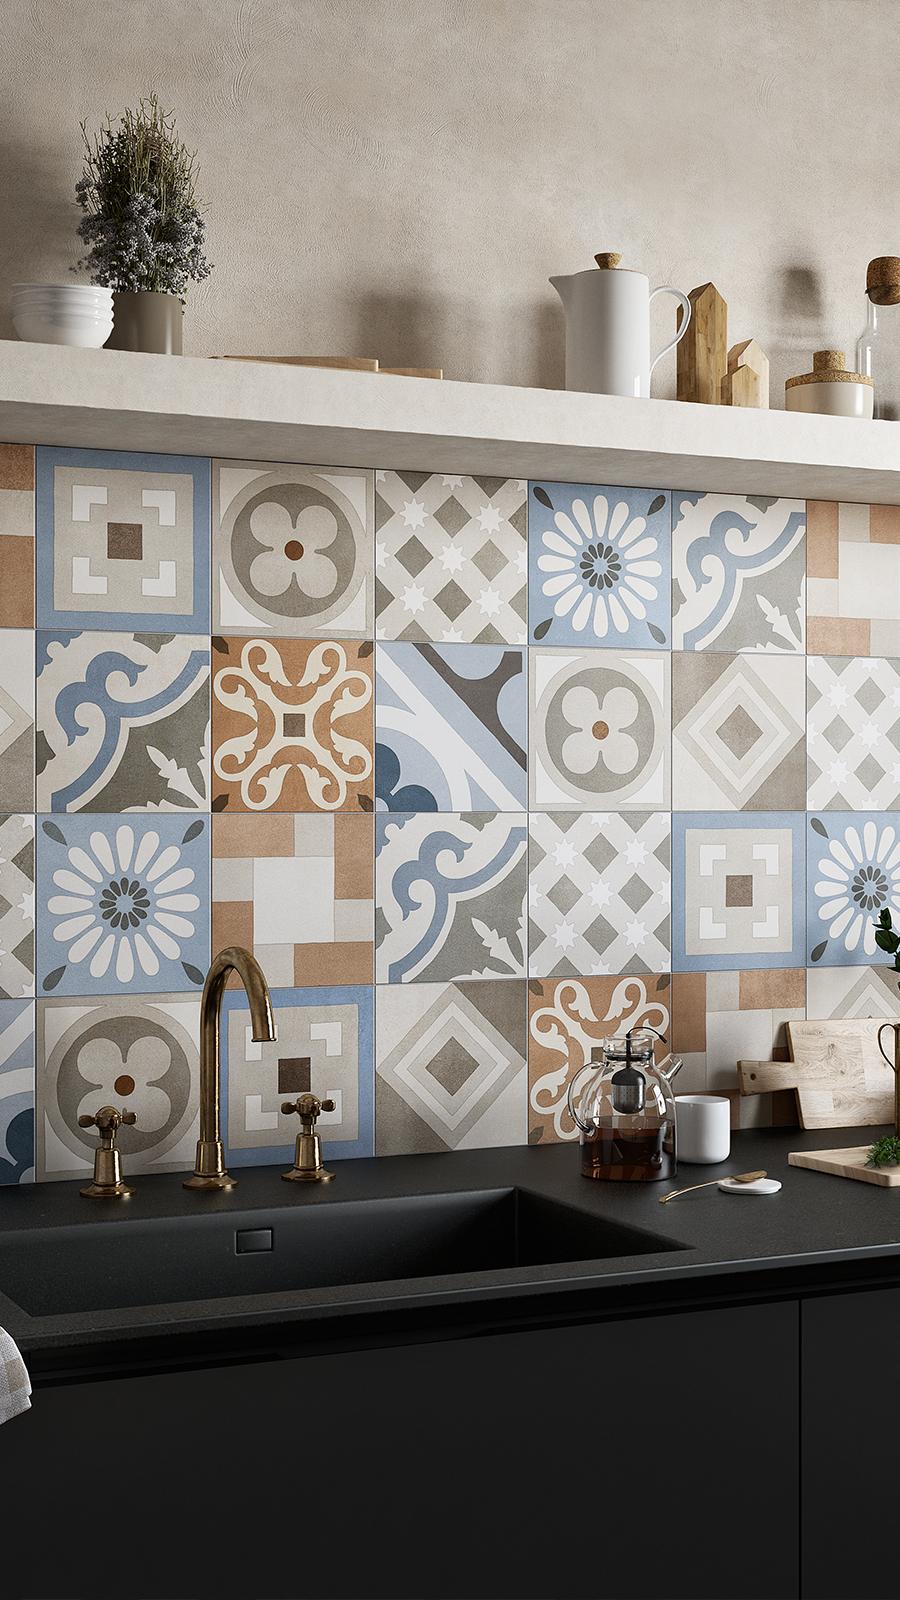 Gres Porcellanato Piastrelle Cucina cementine tiles fioranese